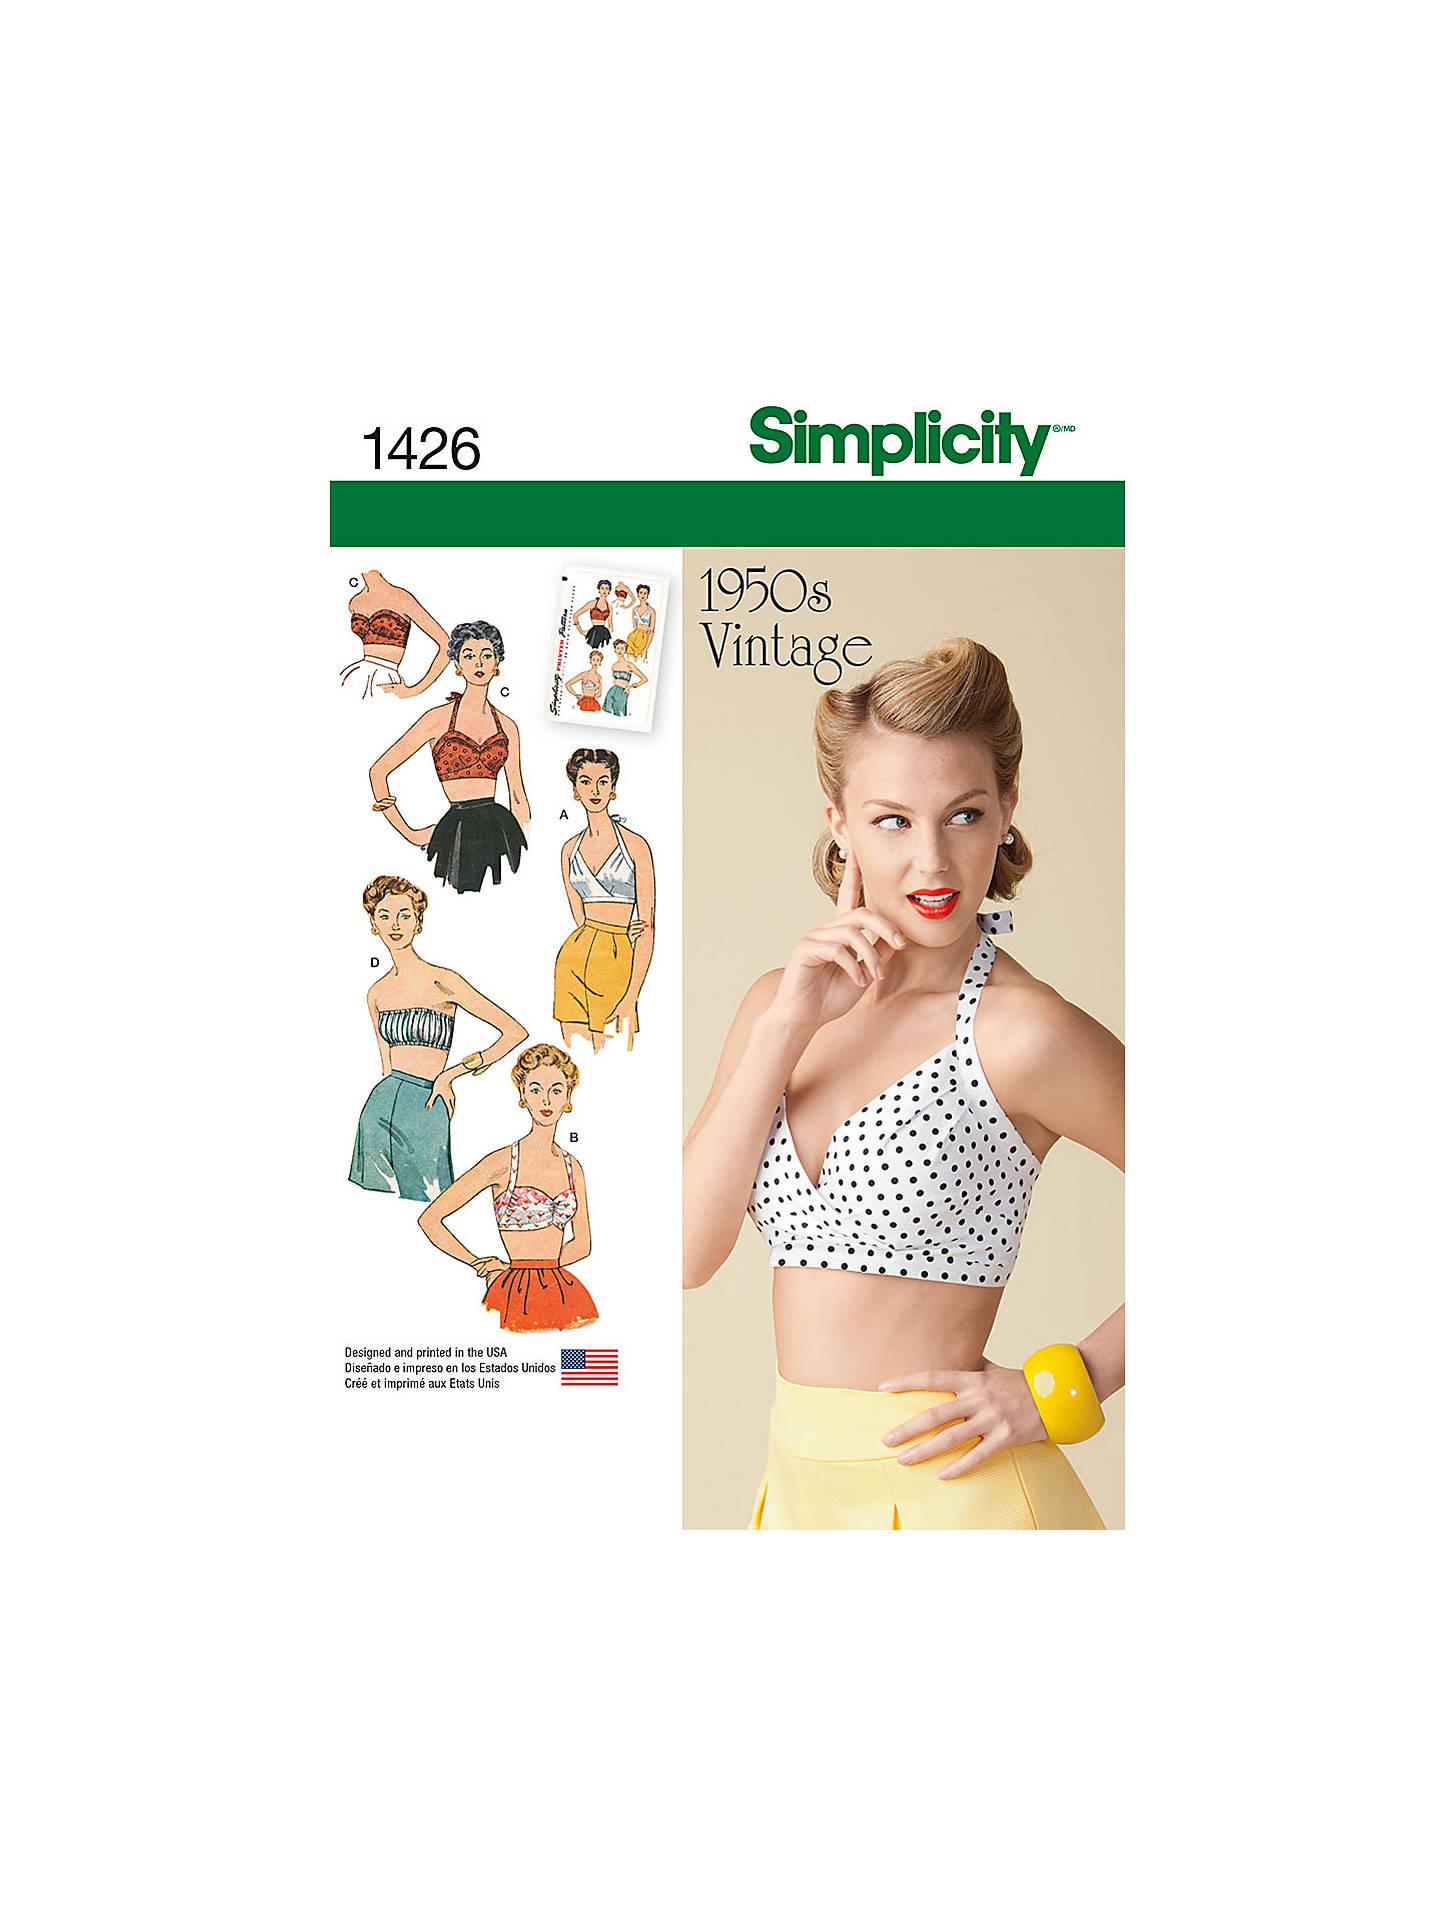 fae974d4081 Buy Simplicity Women's Vintage Bra Top Sewing Pattern, 1426, D5 Online at  johnlewis.